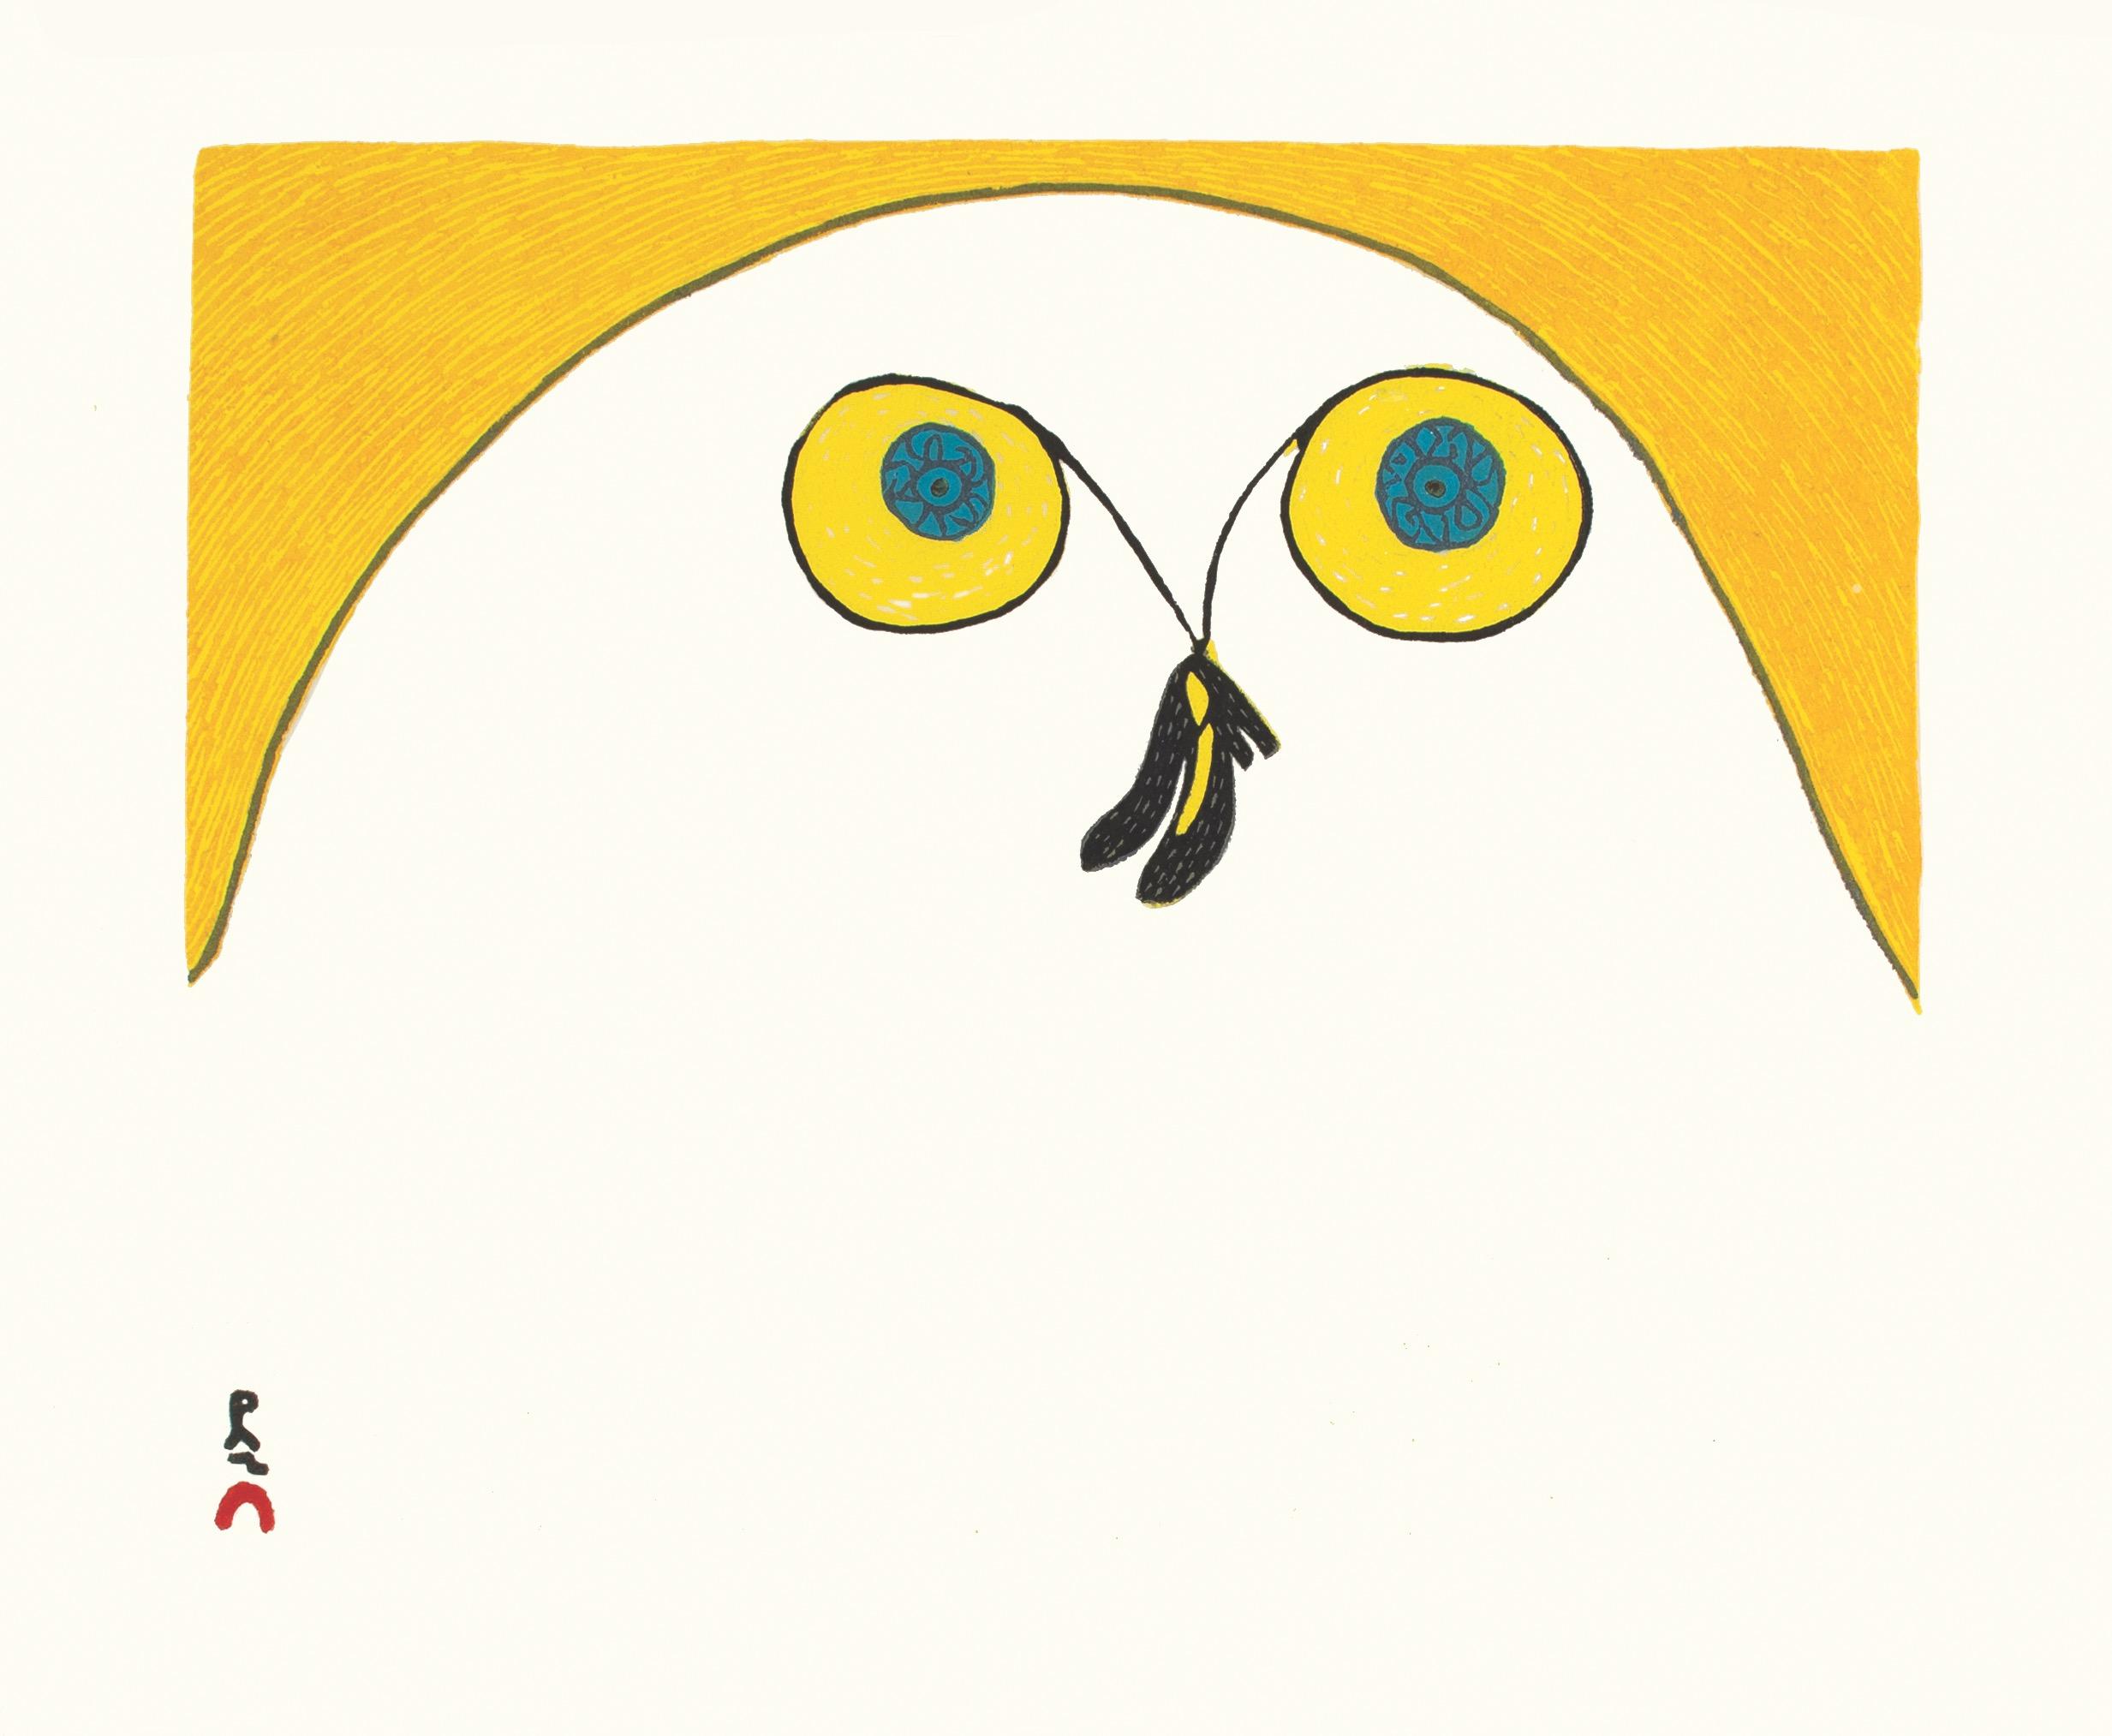 Strutting Owl by Ningiukulu Teevee